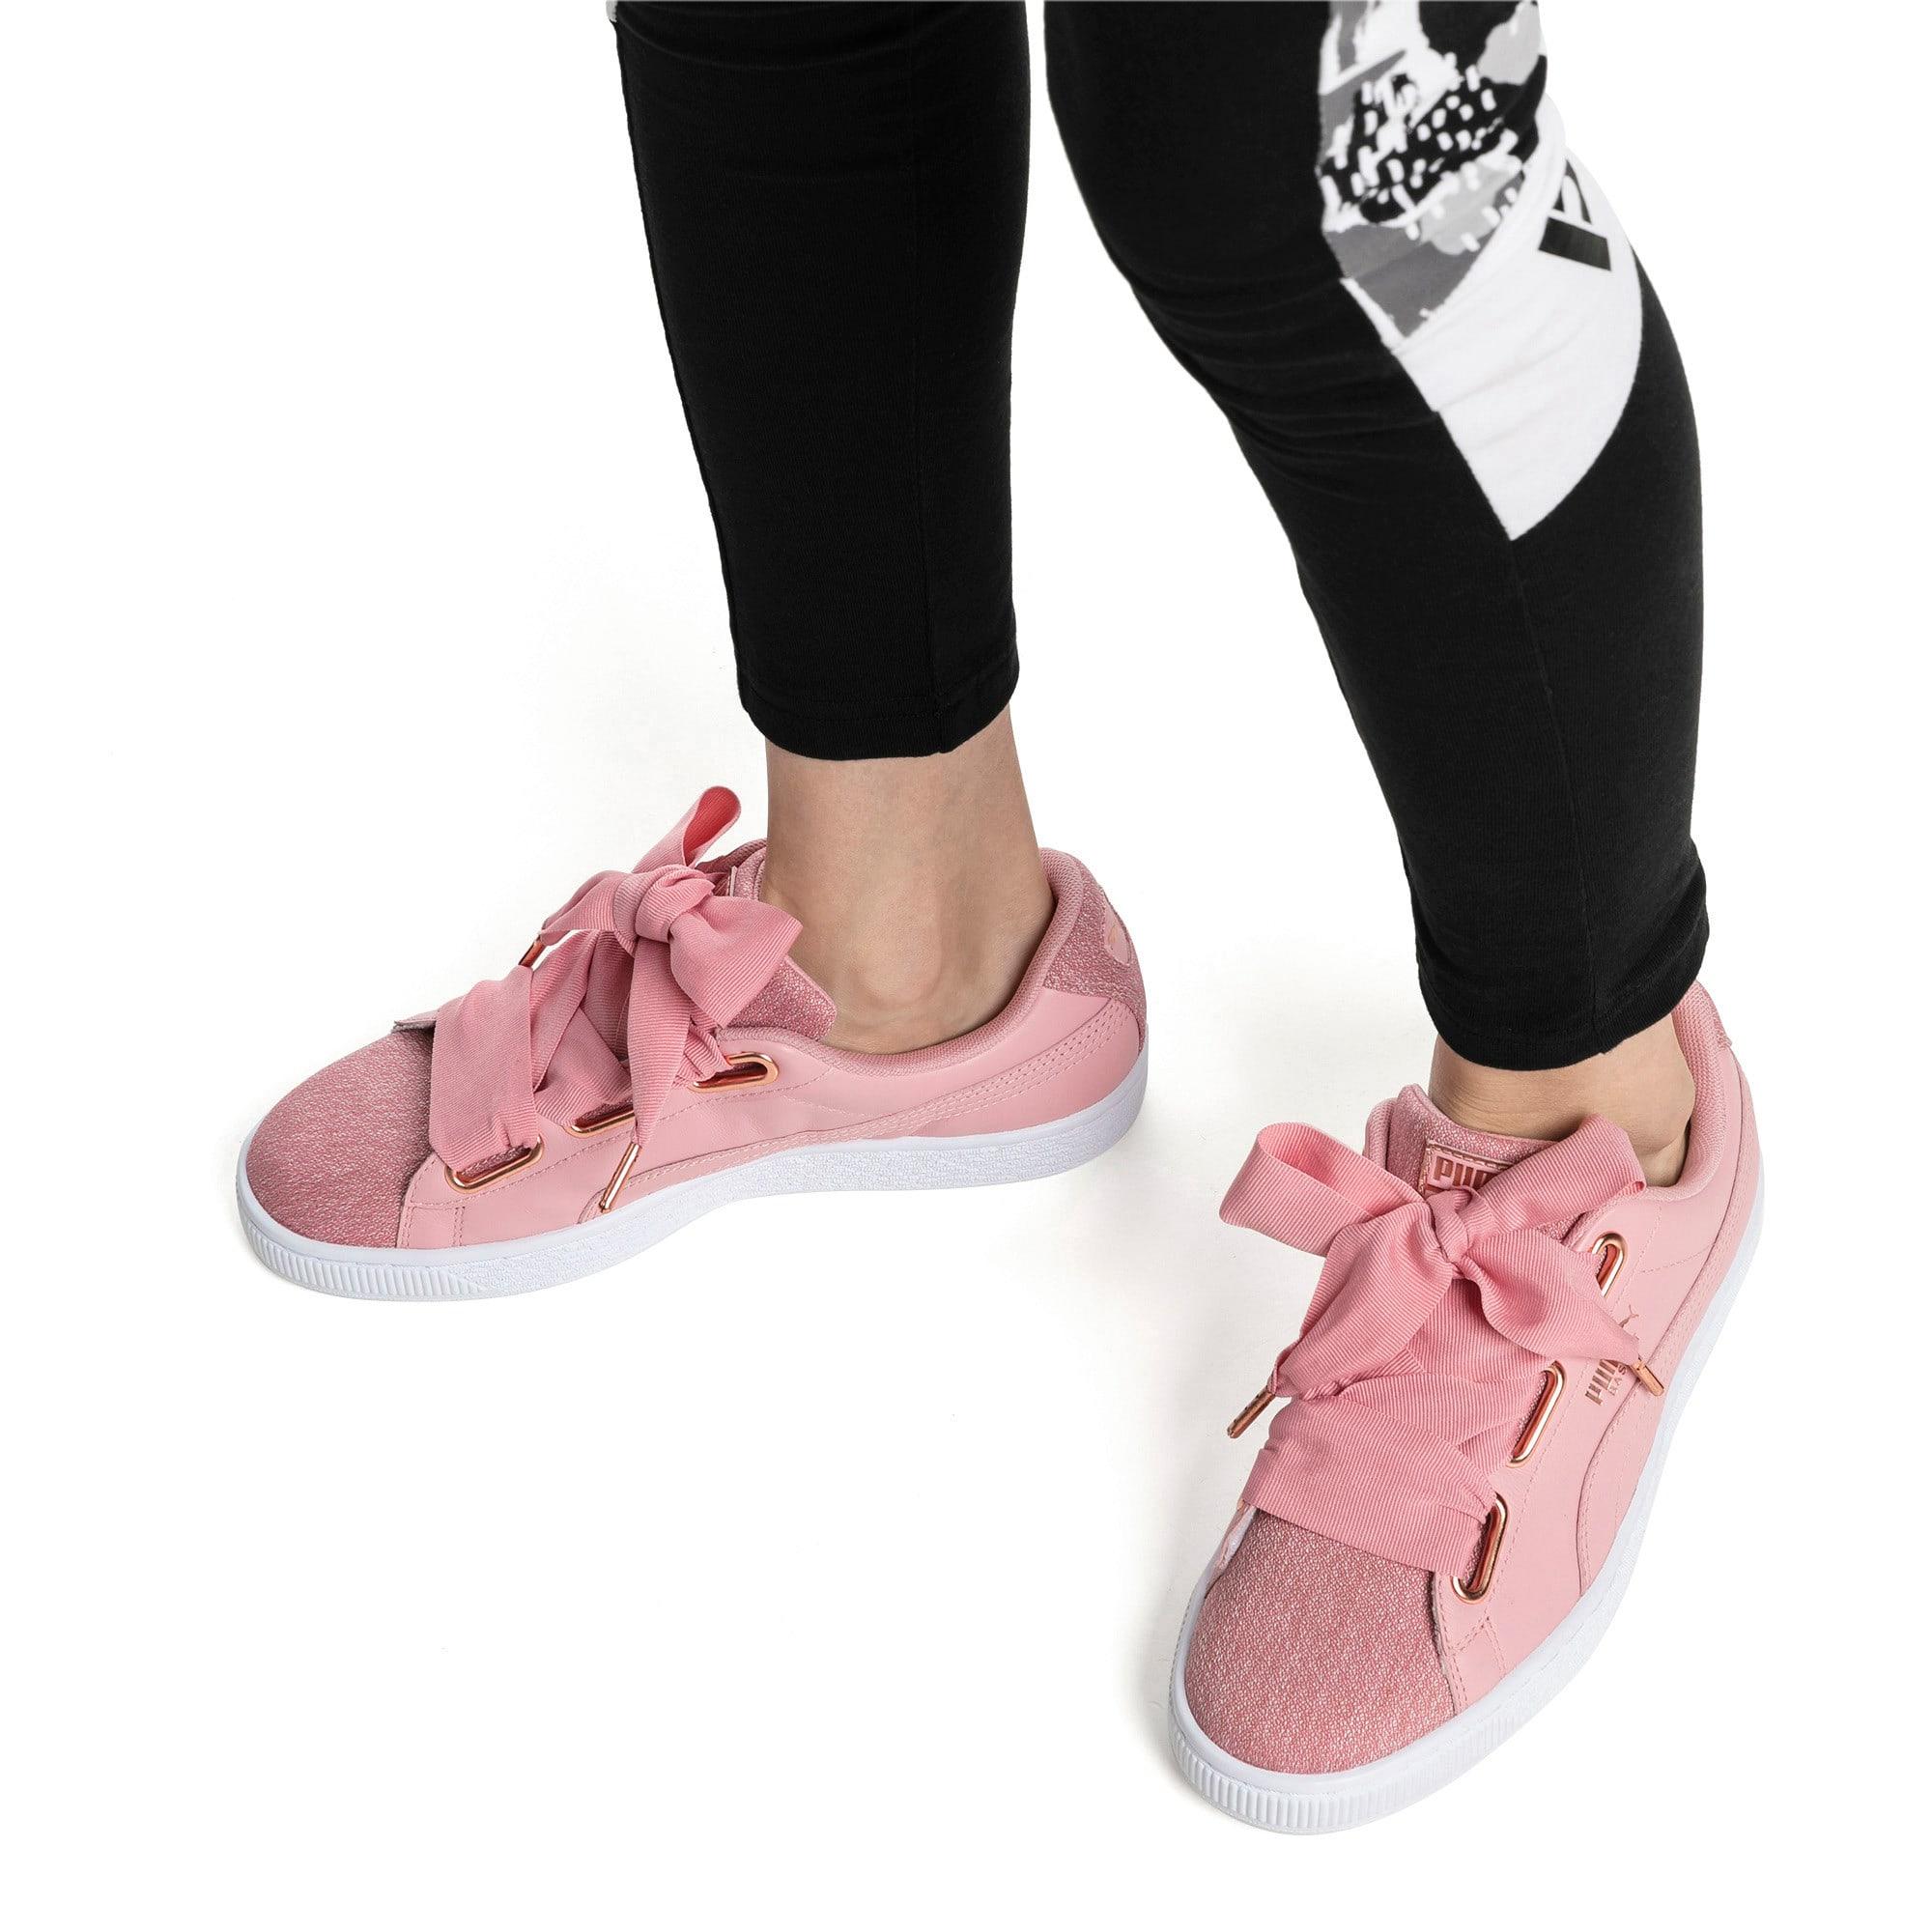 Thumbnail 7 of Basket Heart Woven Rose Women's Sneakers, Bridal Rose-Puma White, medium